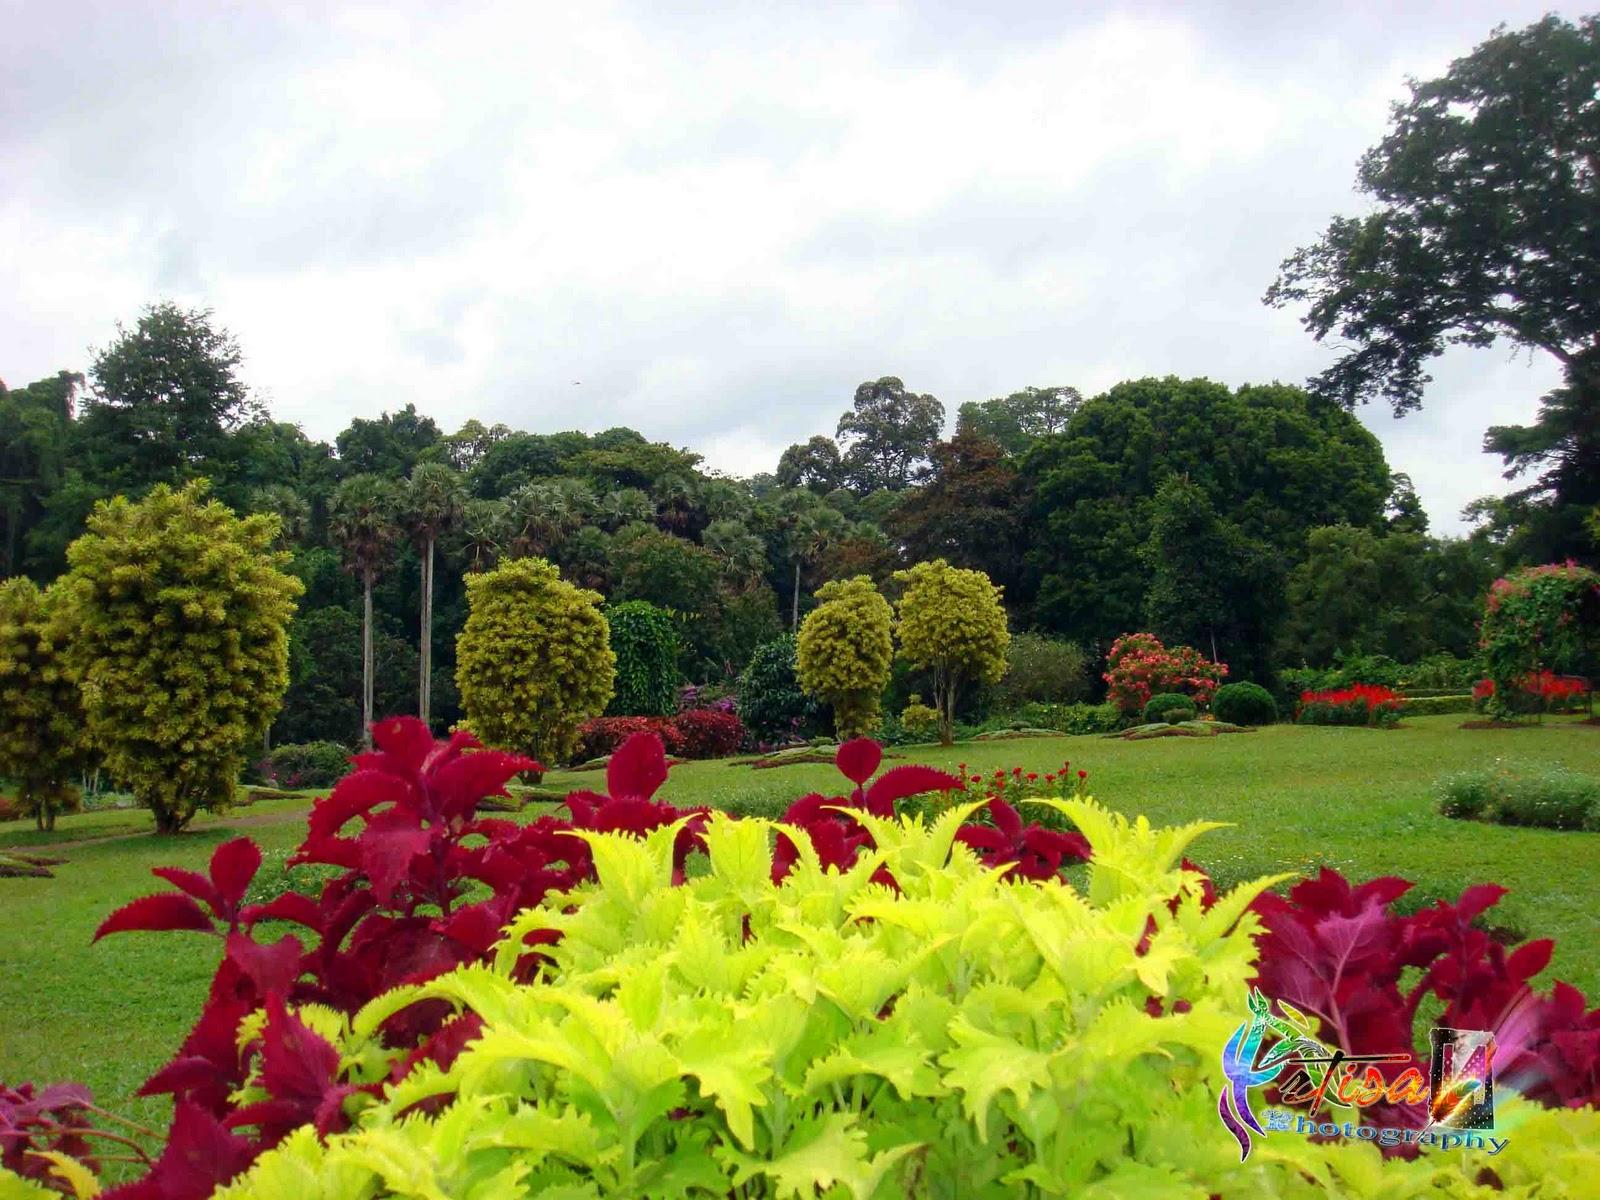 Artisan peradeniya flower garden for Flowers landscape gardening